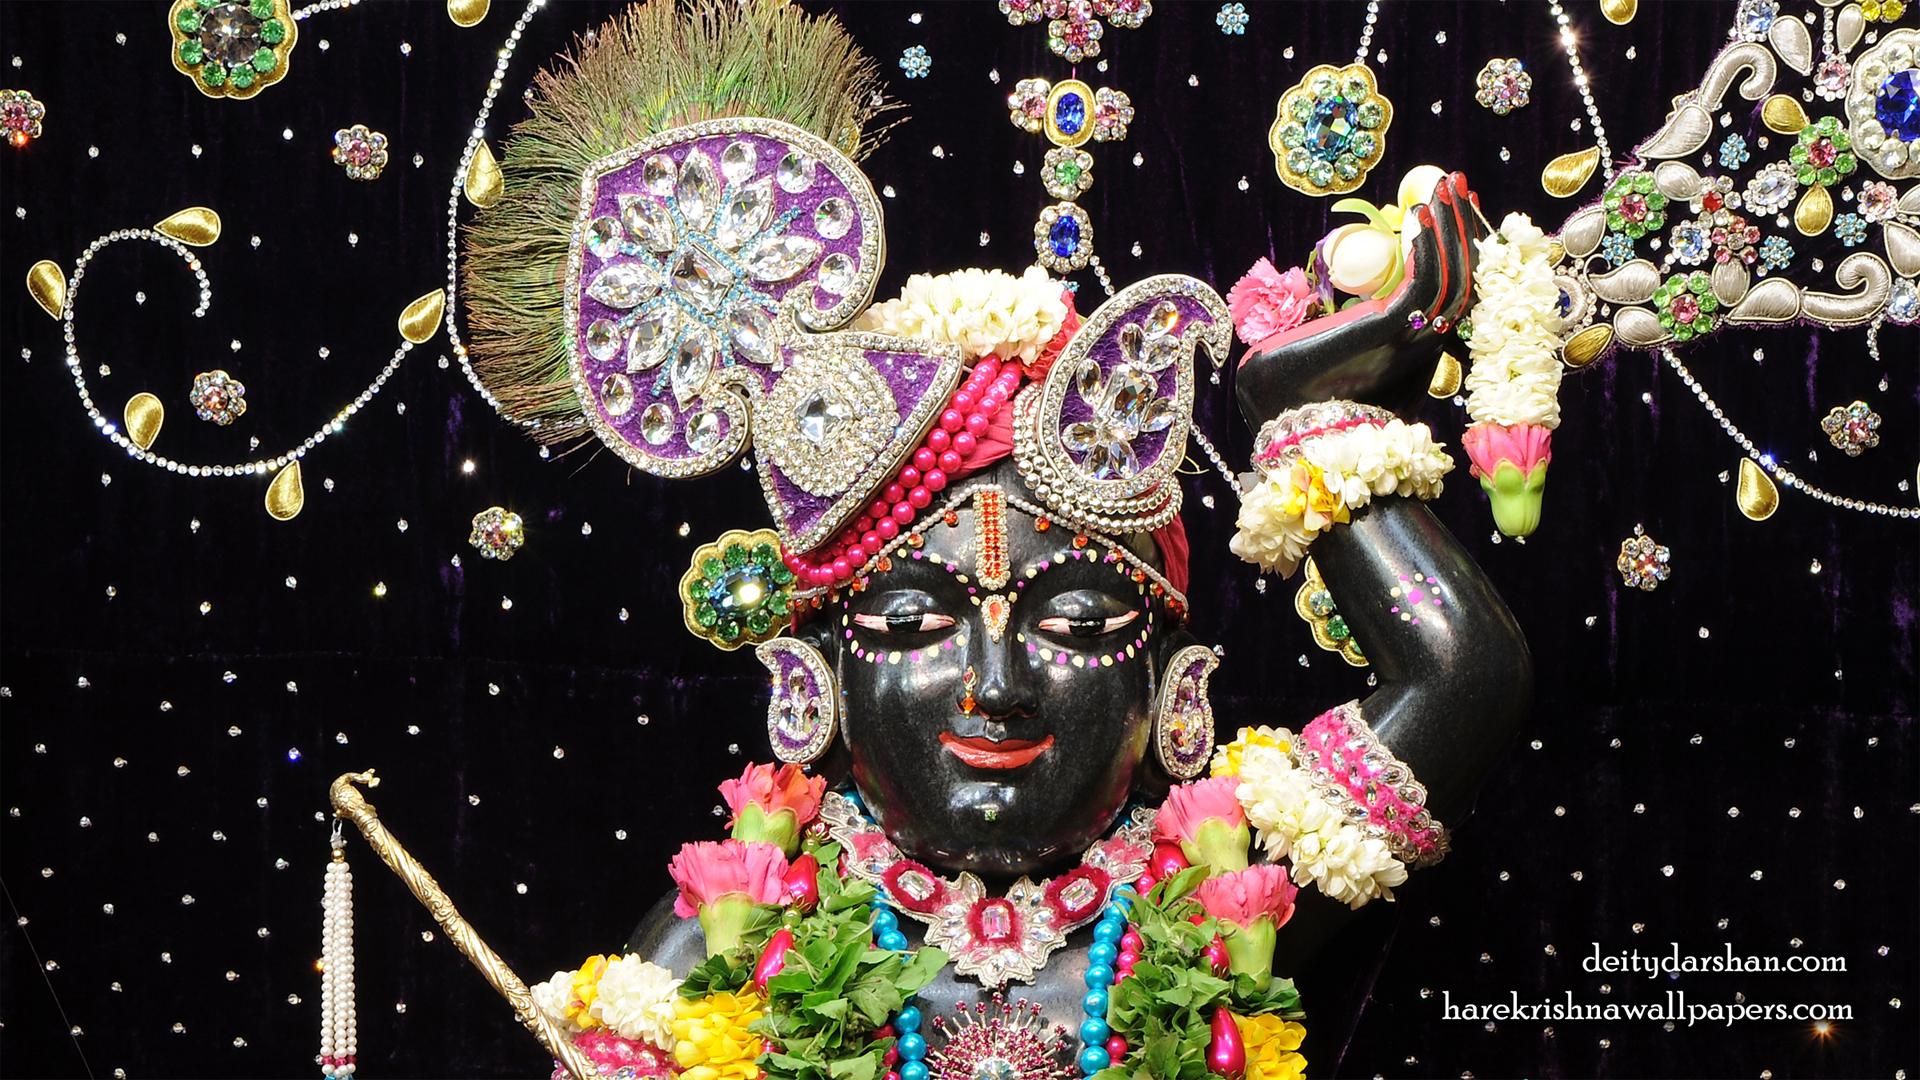 Sri Gopal Close up Wallpaper (022) Size 1920x1080 Download